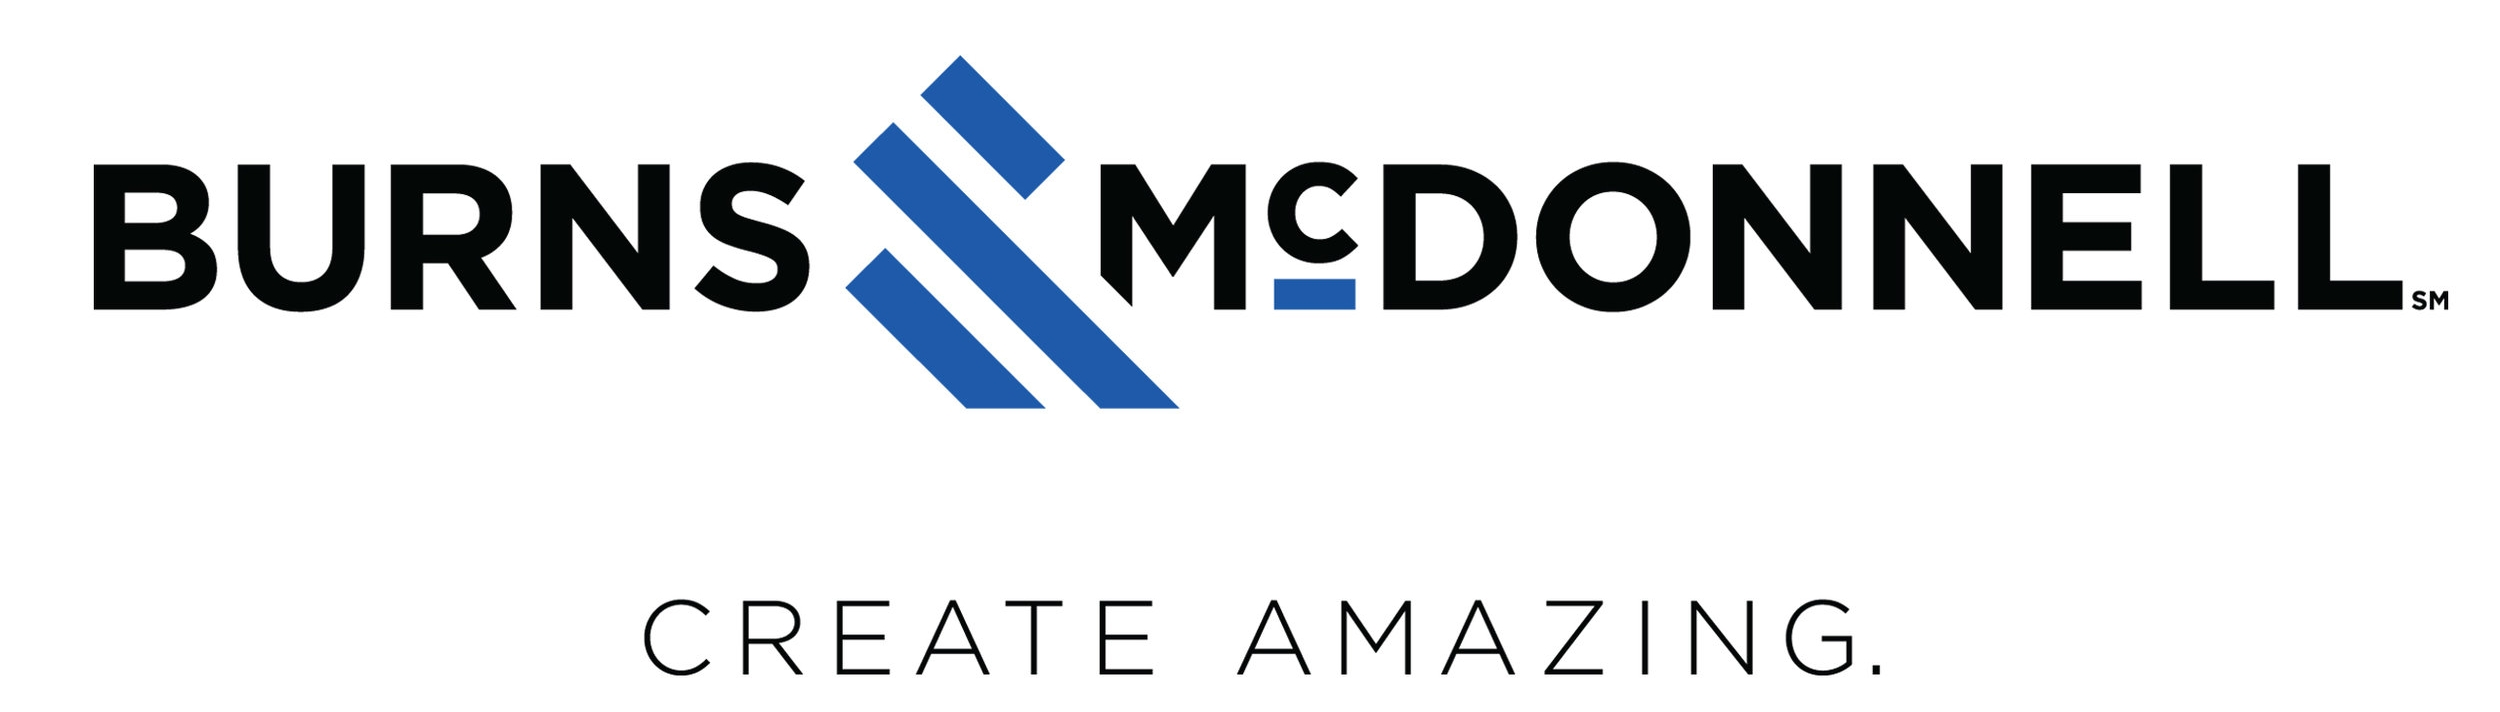 Copy of BMcDlogo_CreateAmazing.jpg